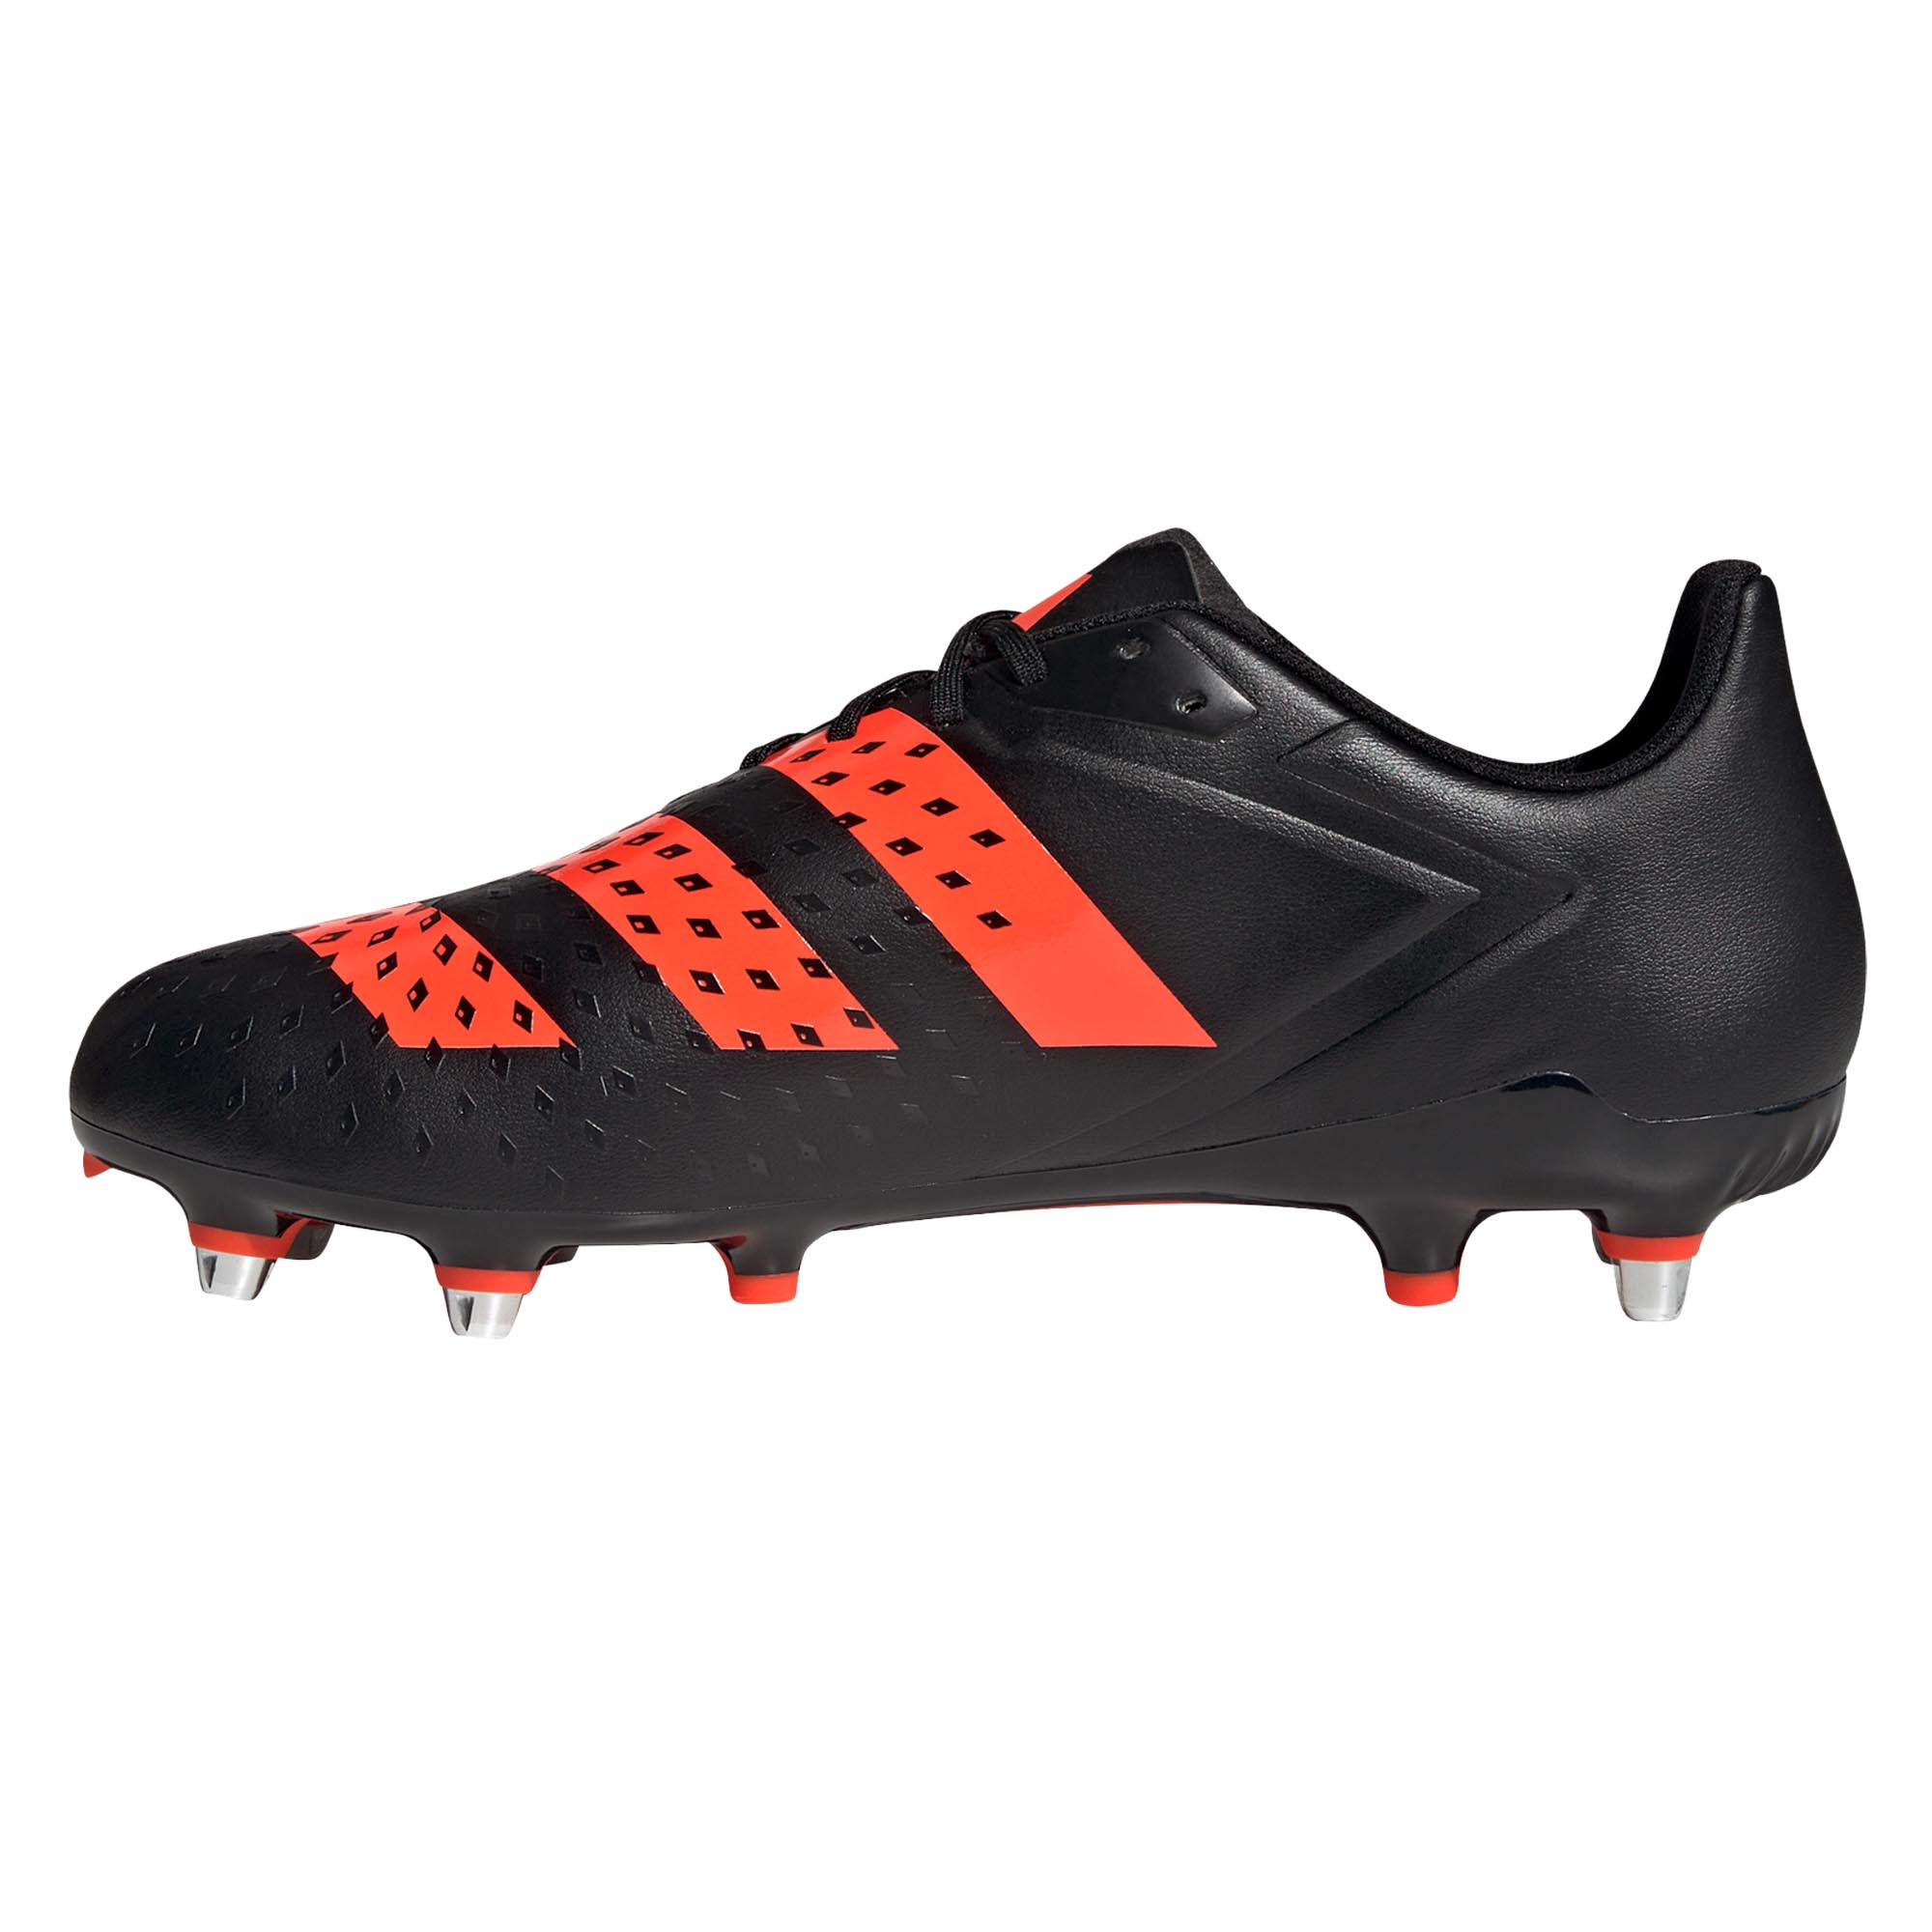 miniature 7 - Adidas Malice SG Terrain Souple Adulte Unisexe Rugby Boot Noir/Rouge